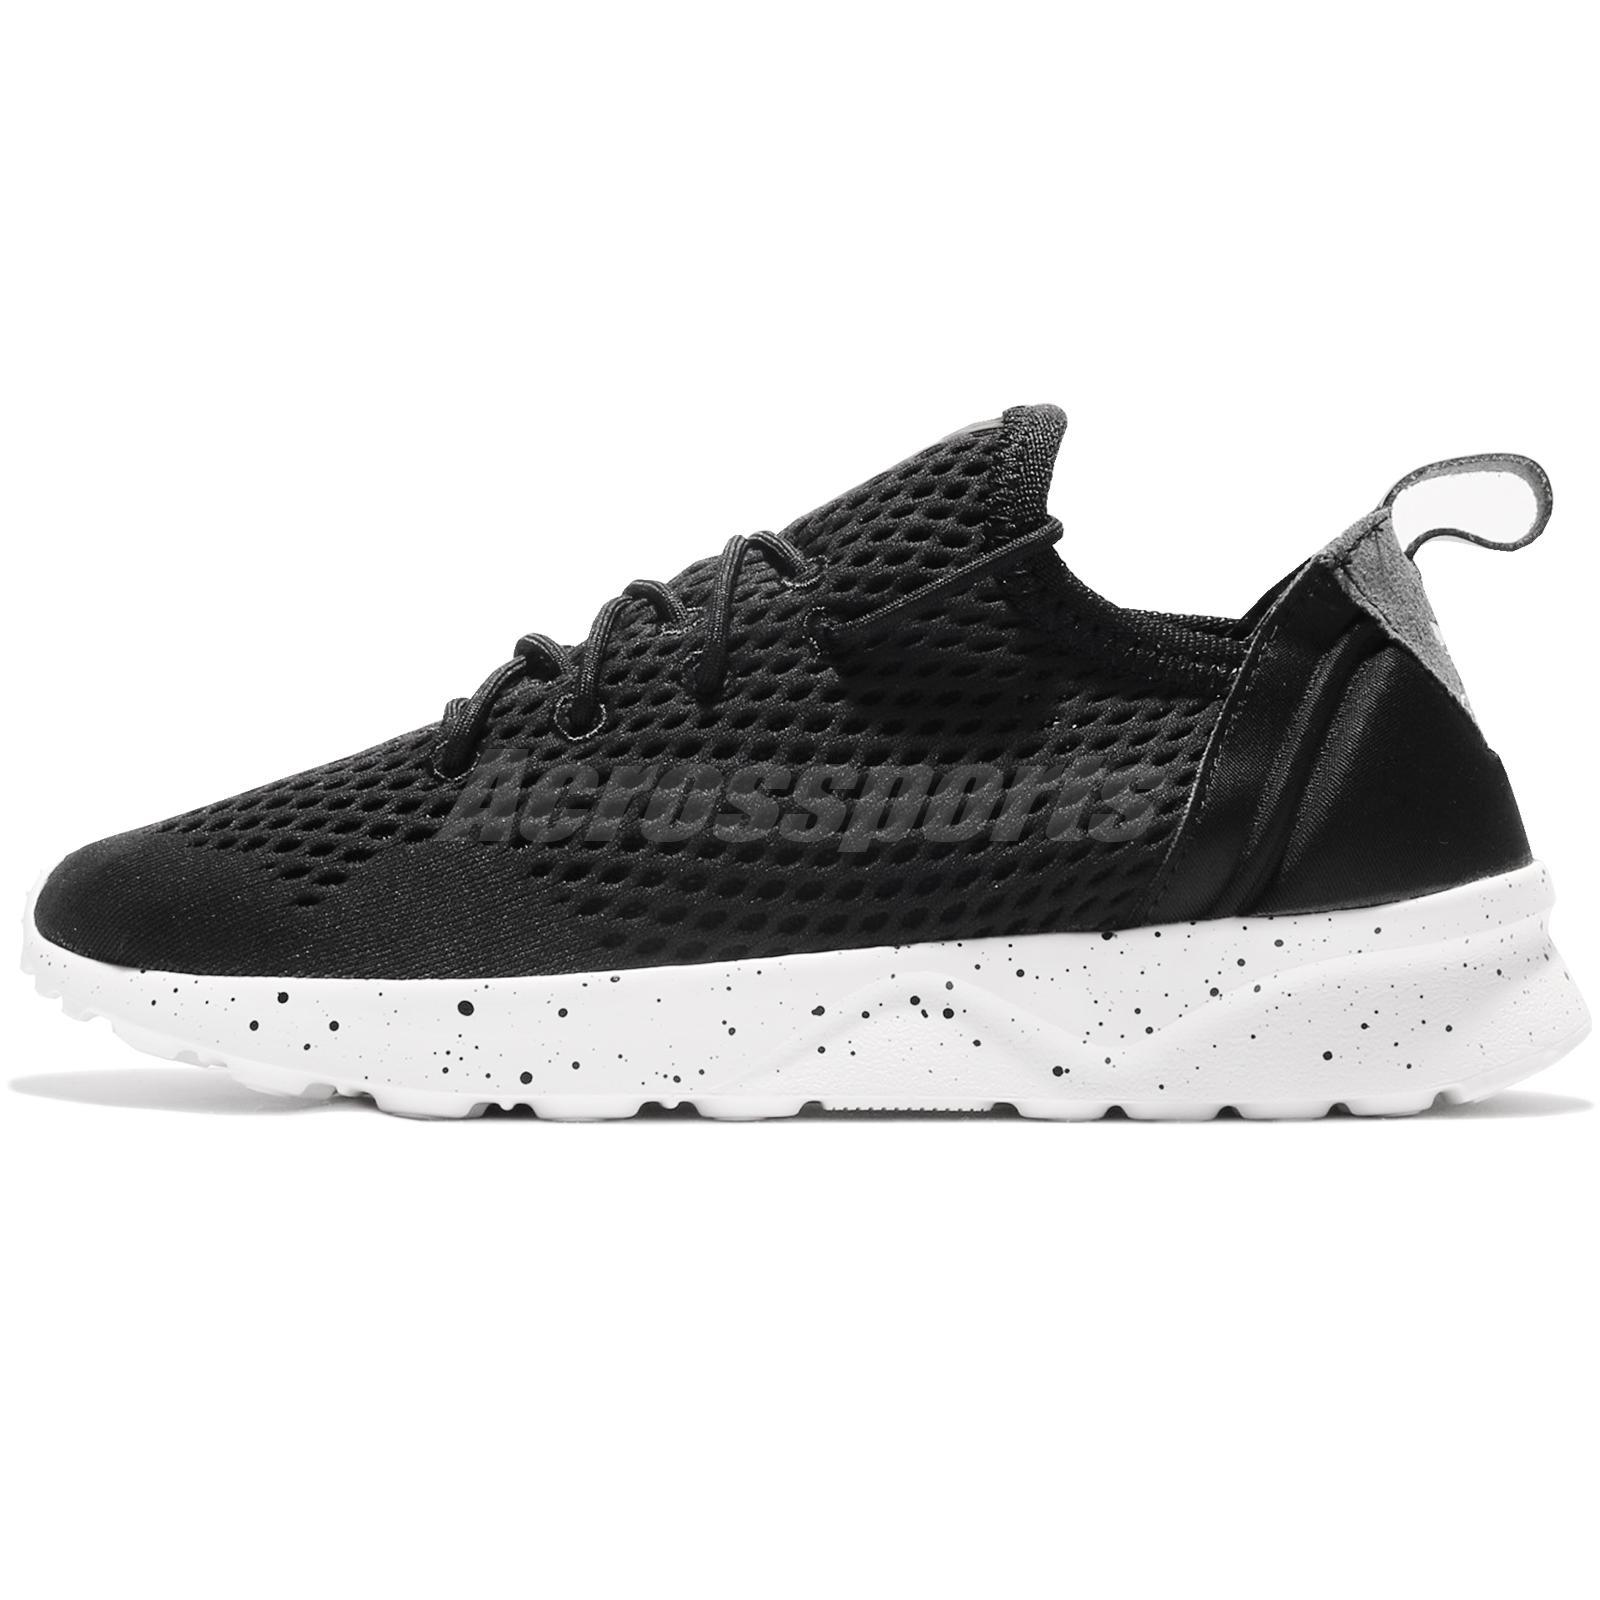 4e5d7c87f7f8b adidas Originals ZX Flux ADV Virtue EM W Black White Mesh Women Shoes BB2304